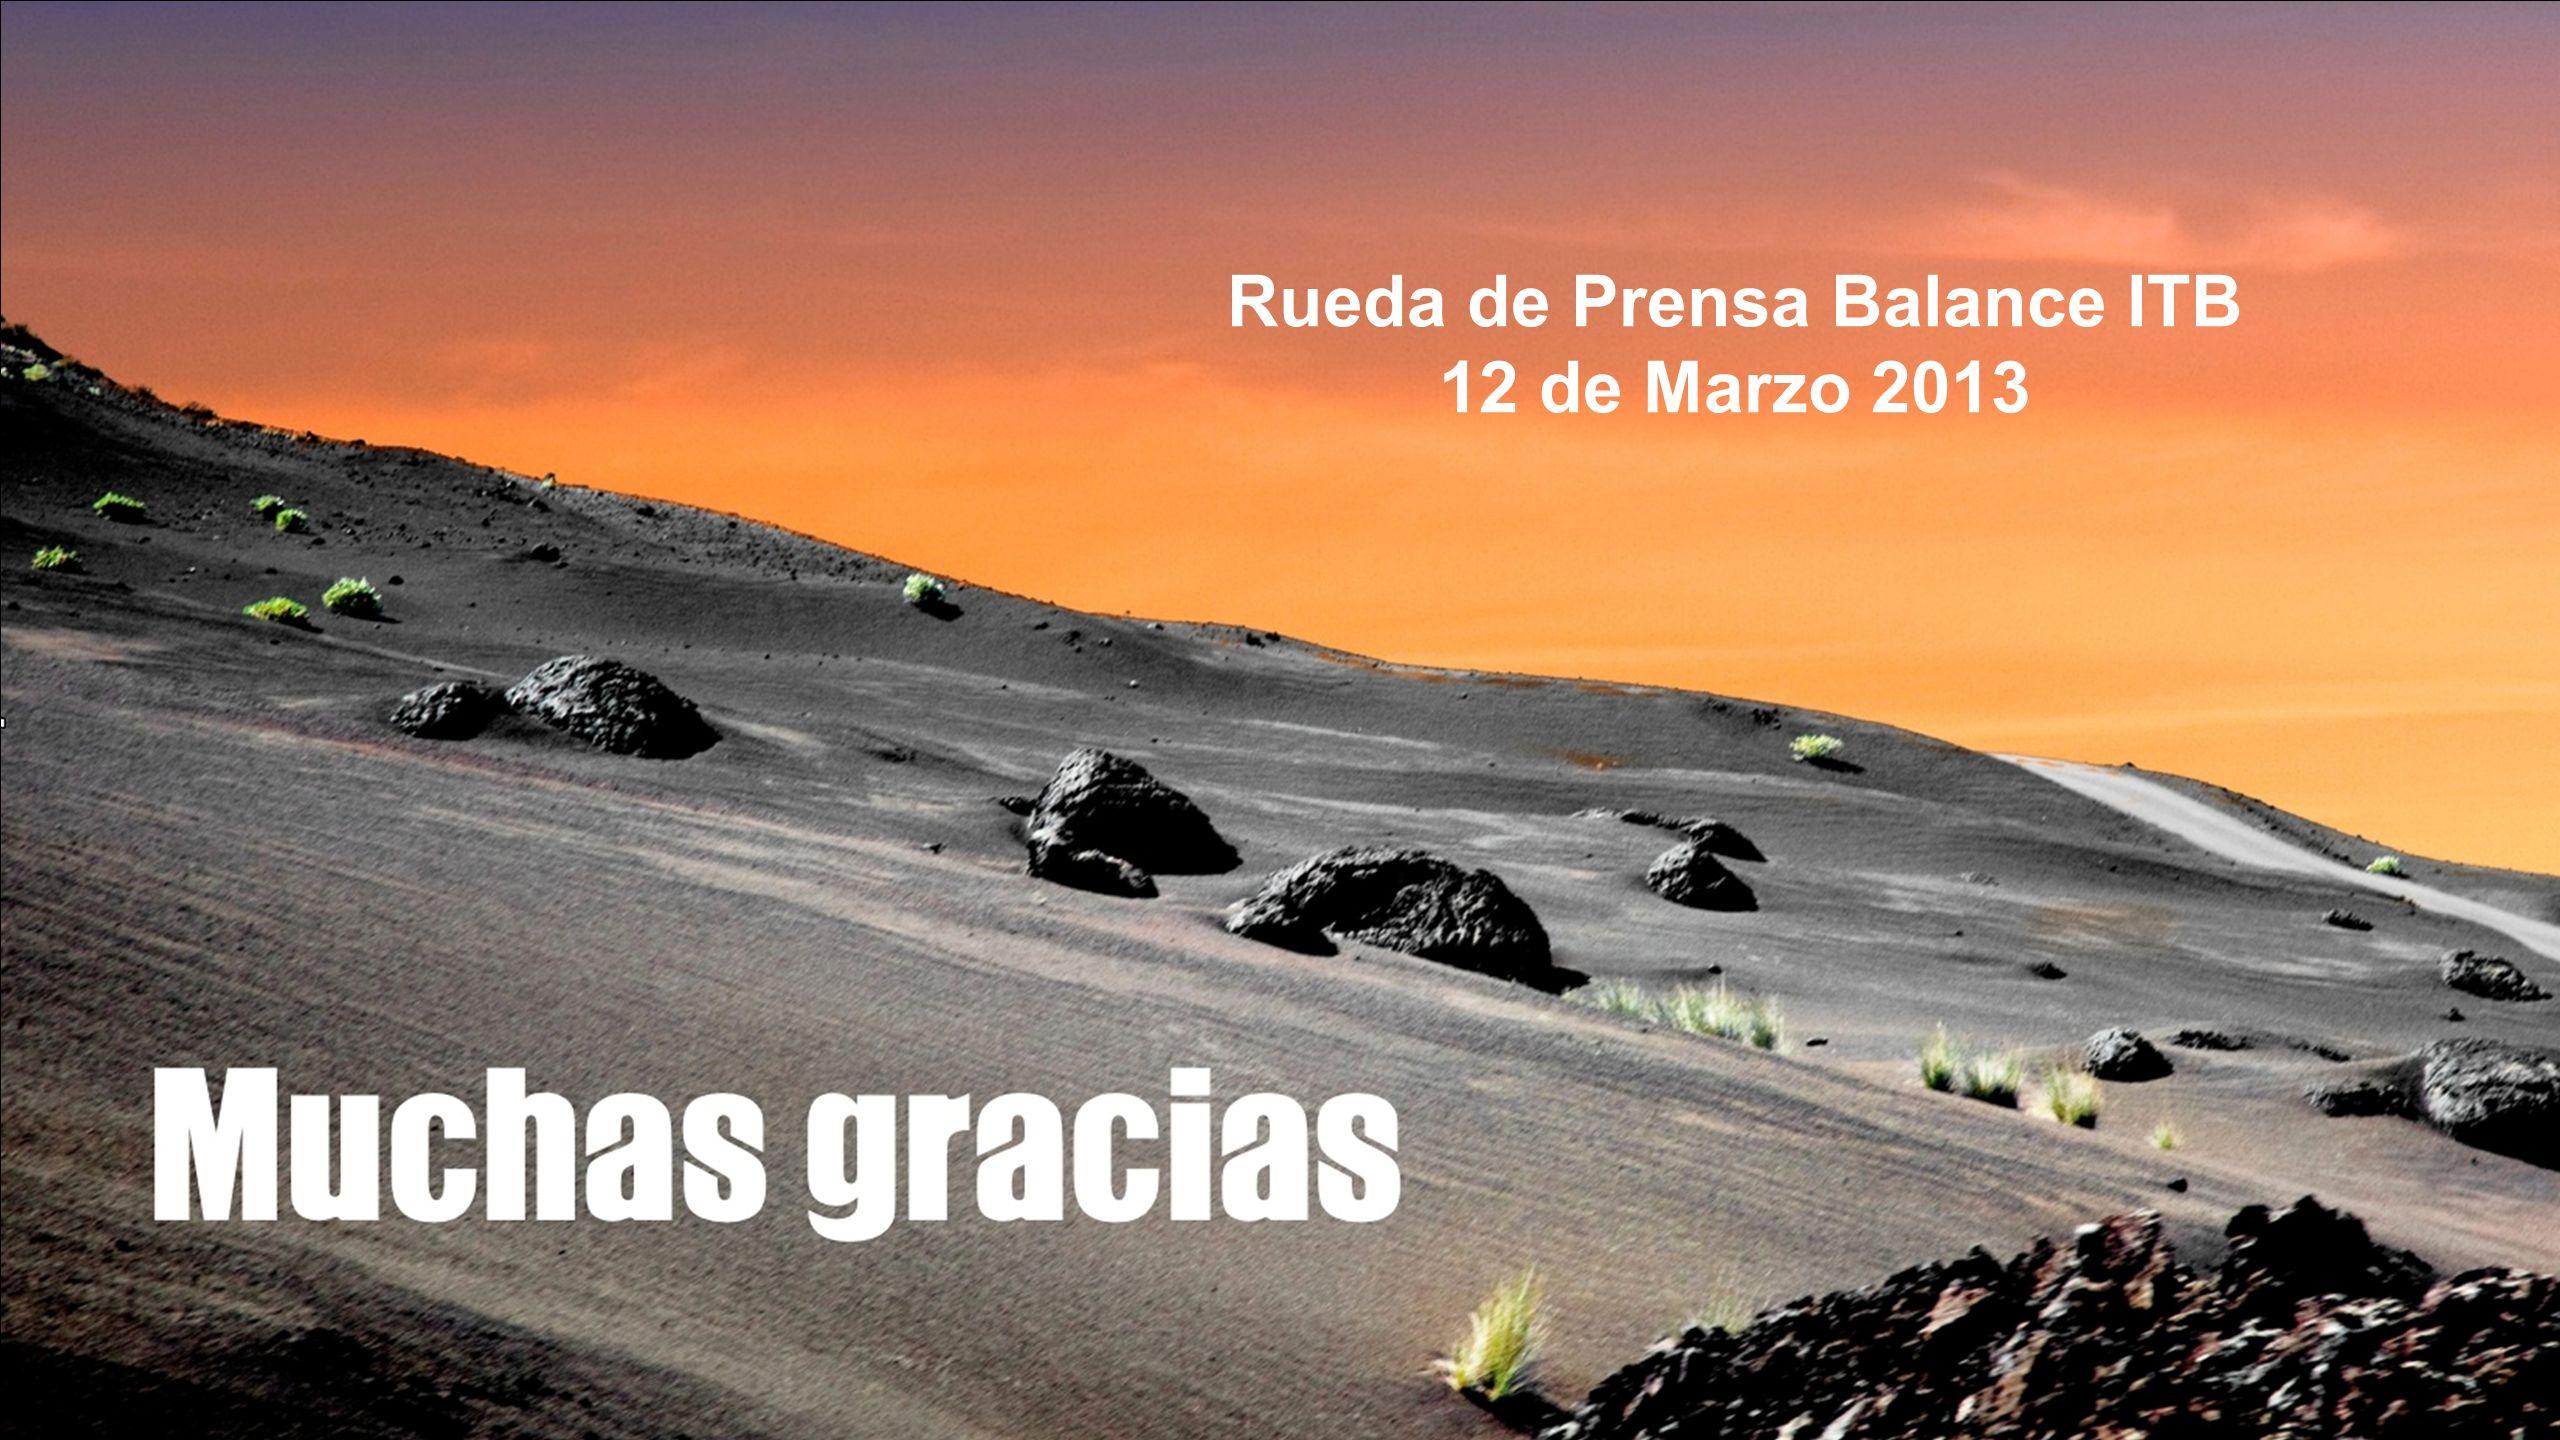 Rueda de Prensa Balance ITB